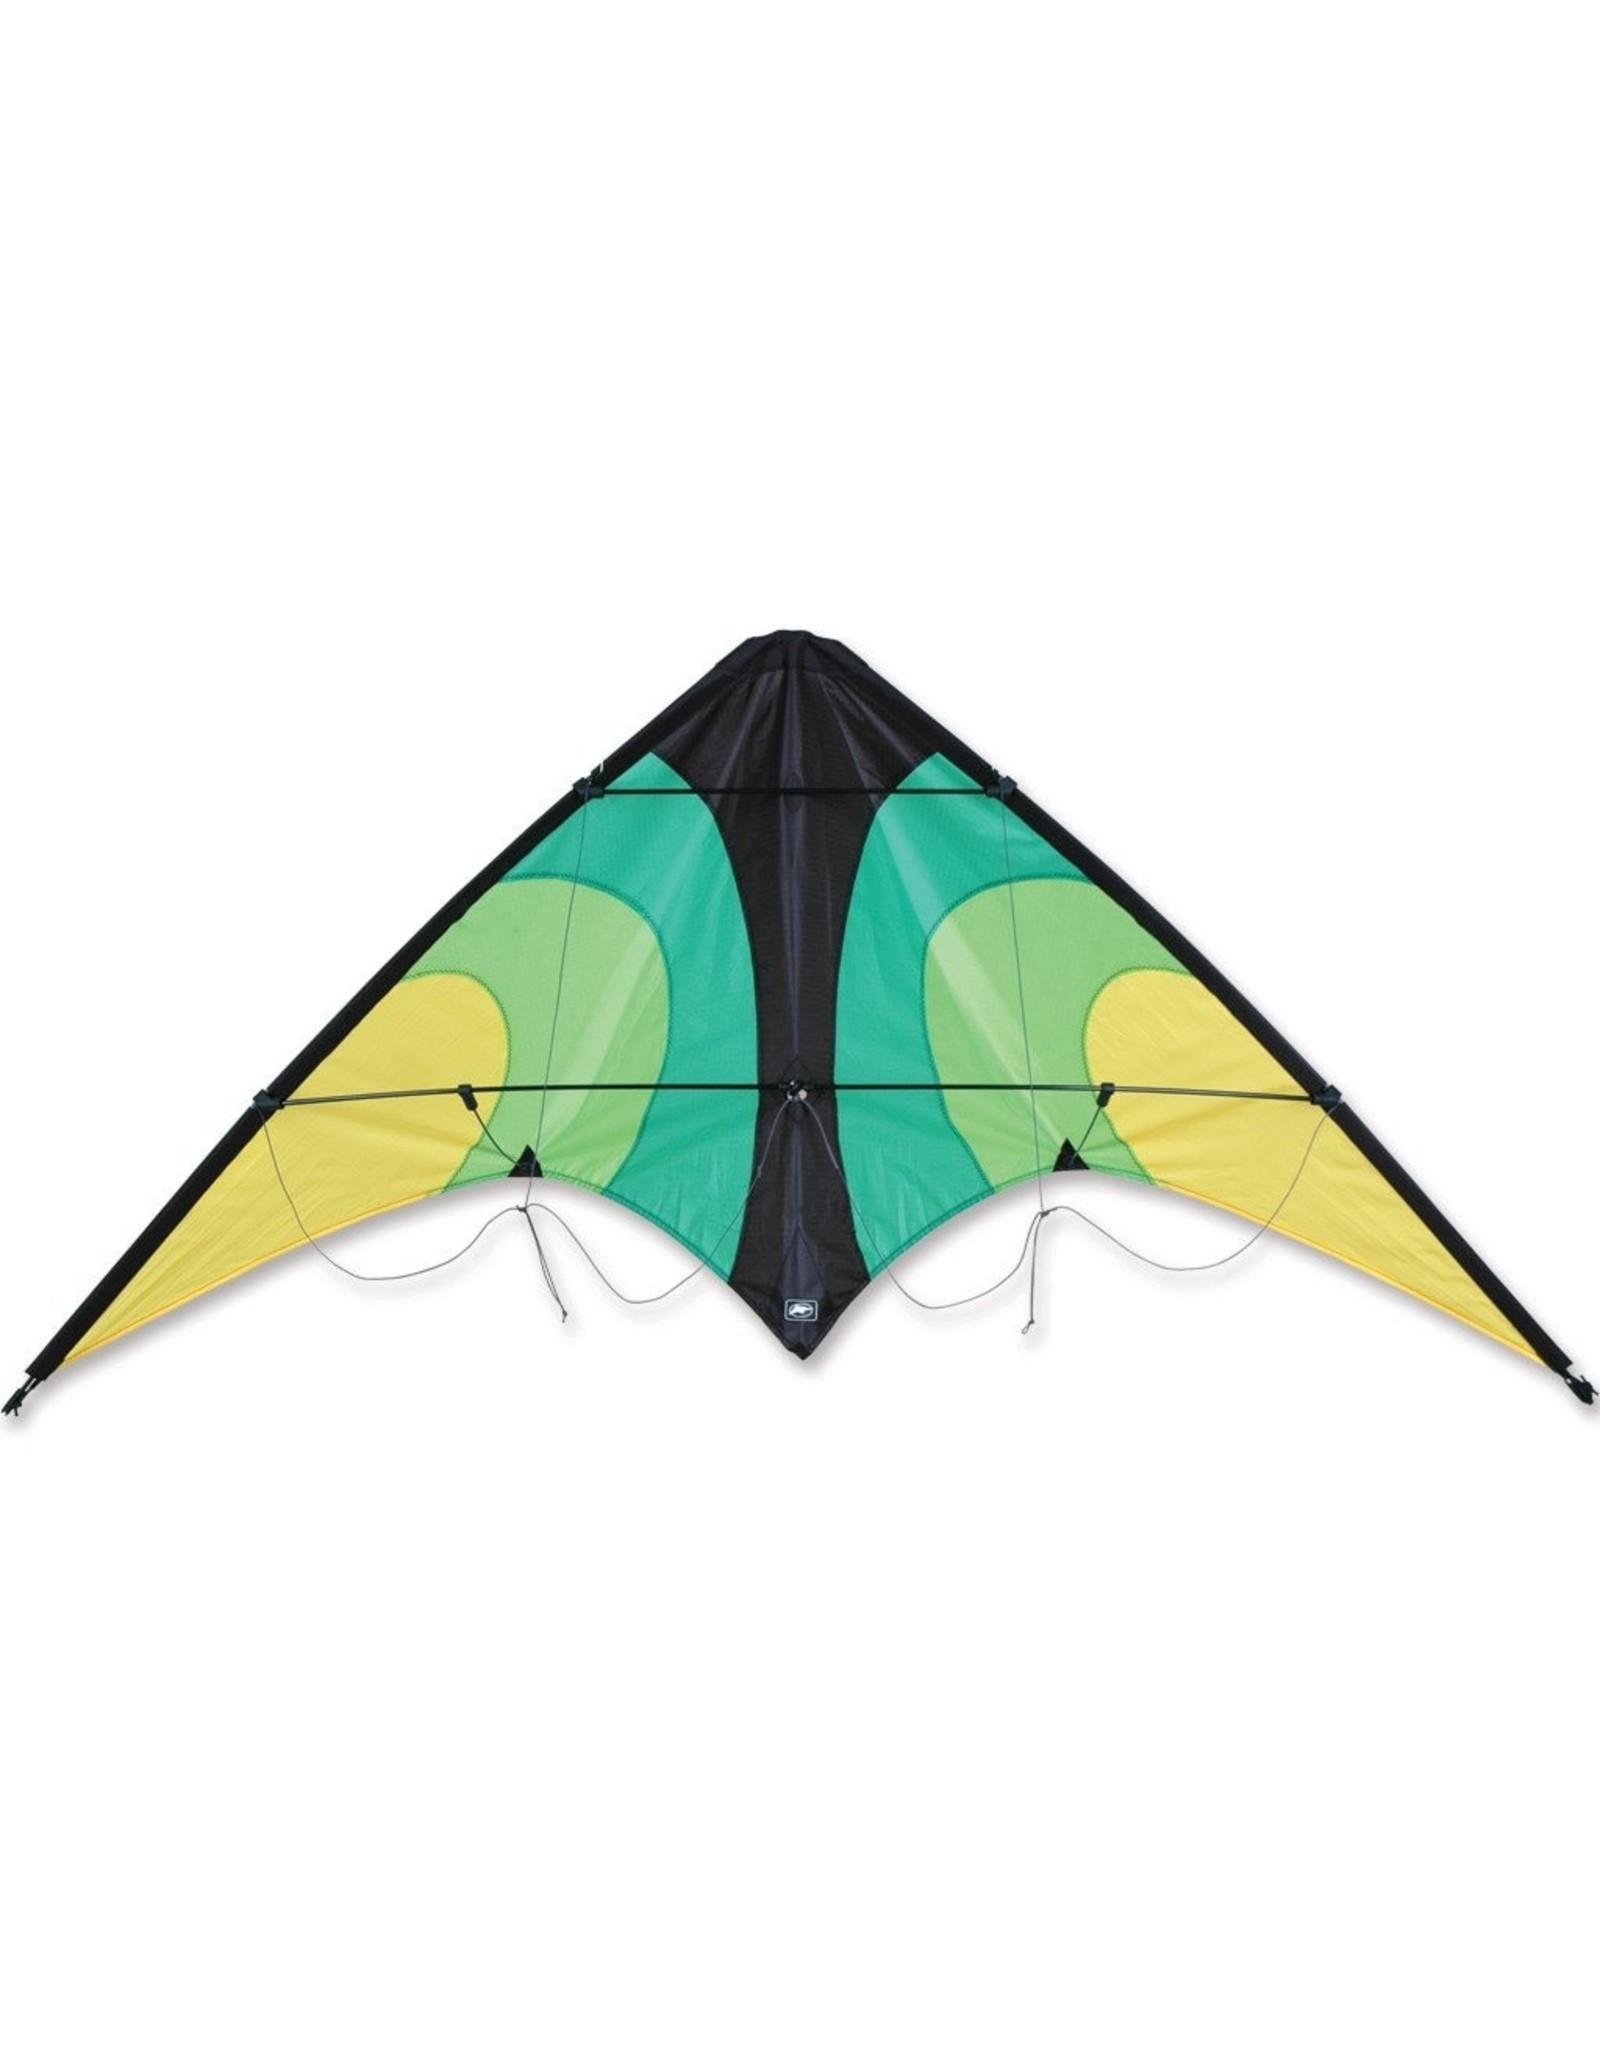 Premier Kites Lightning Dual Line Sport Kite Emerald